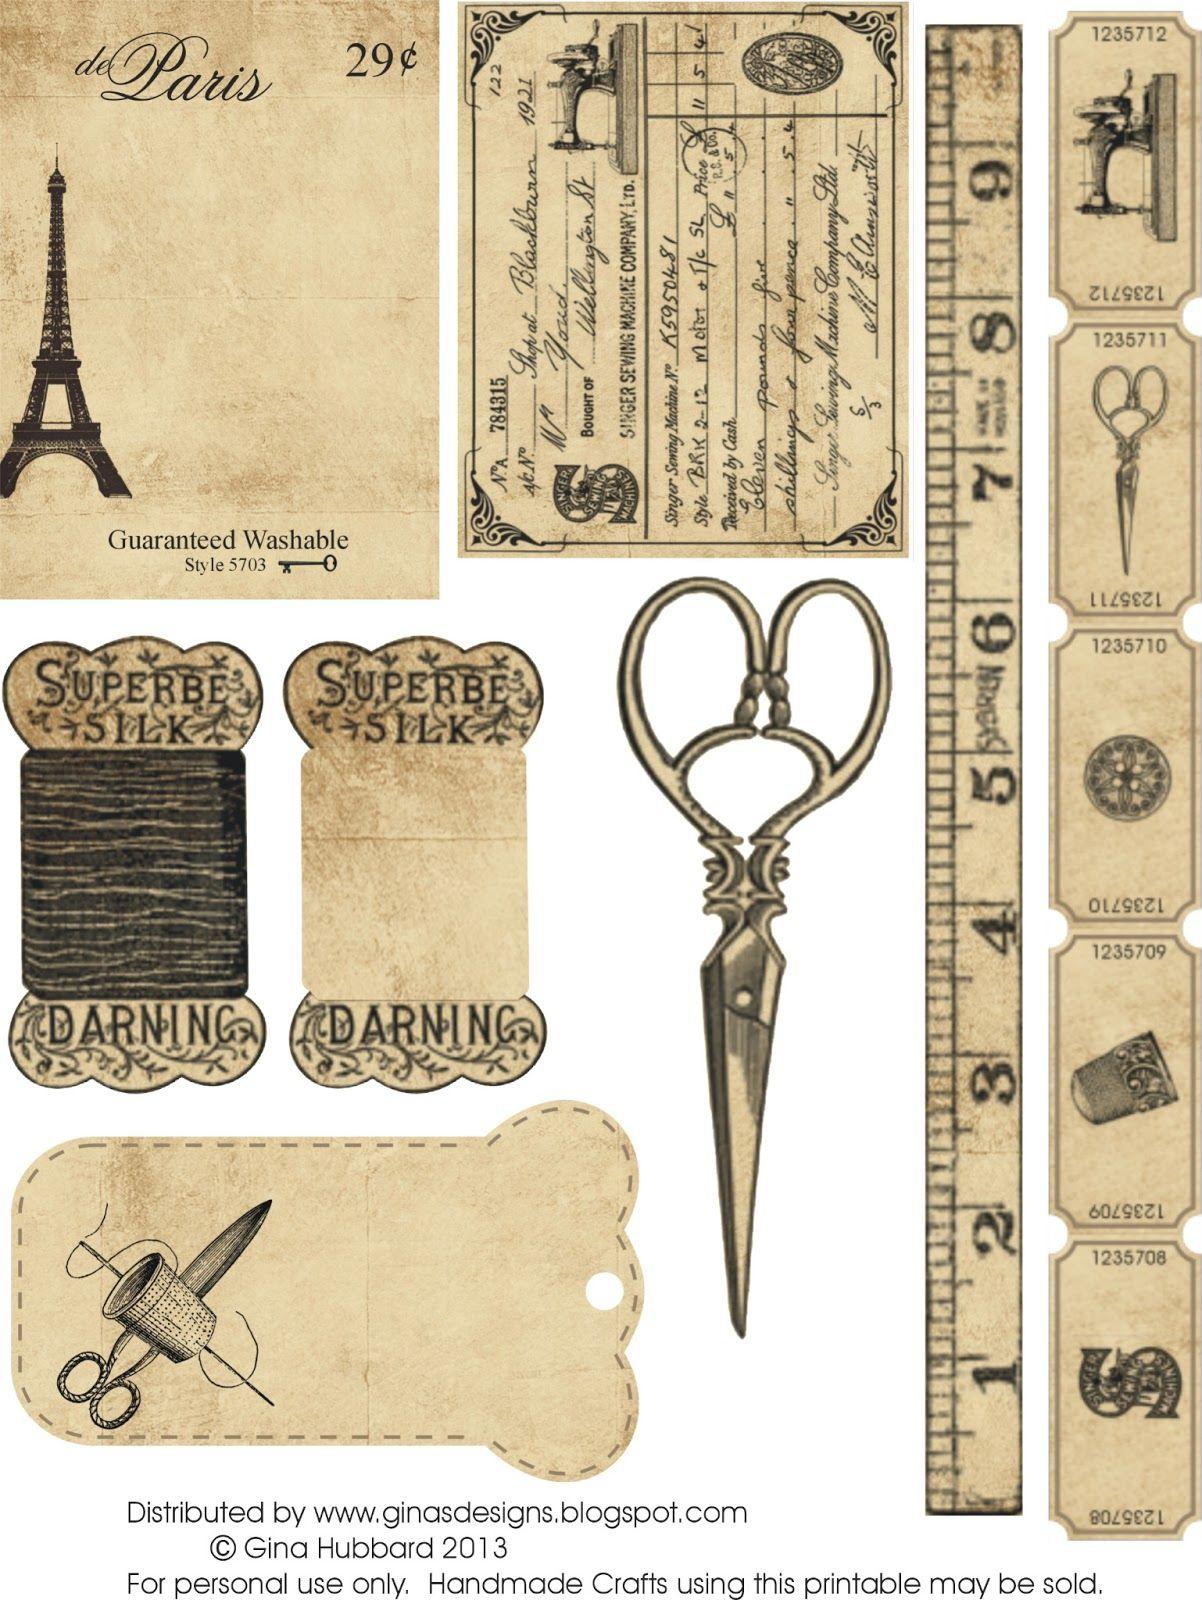 Sewing Printables Free Vintage A Imprimer Gratuit Thme Couture Aah Printables Pinterest